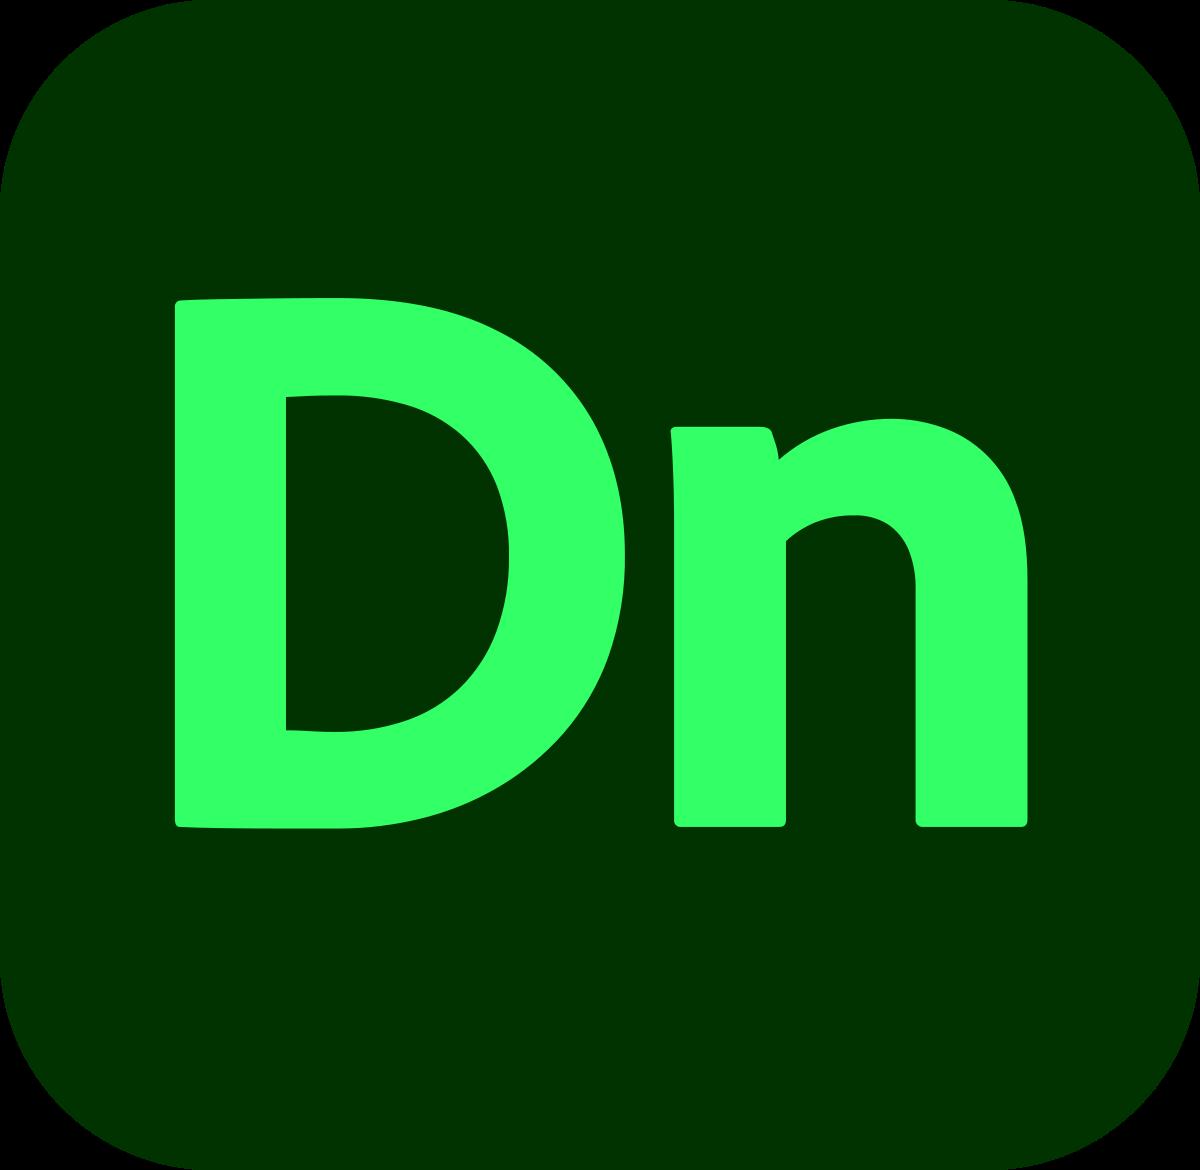 Adobe Dimension CC 2021 3.4.1 Crack Free Download